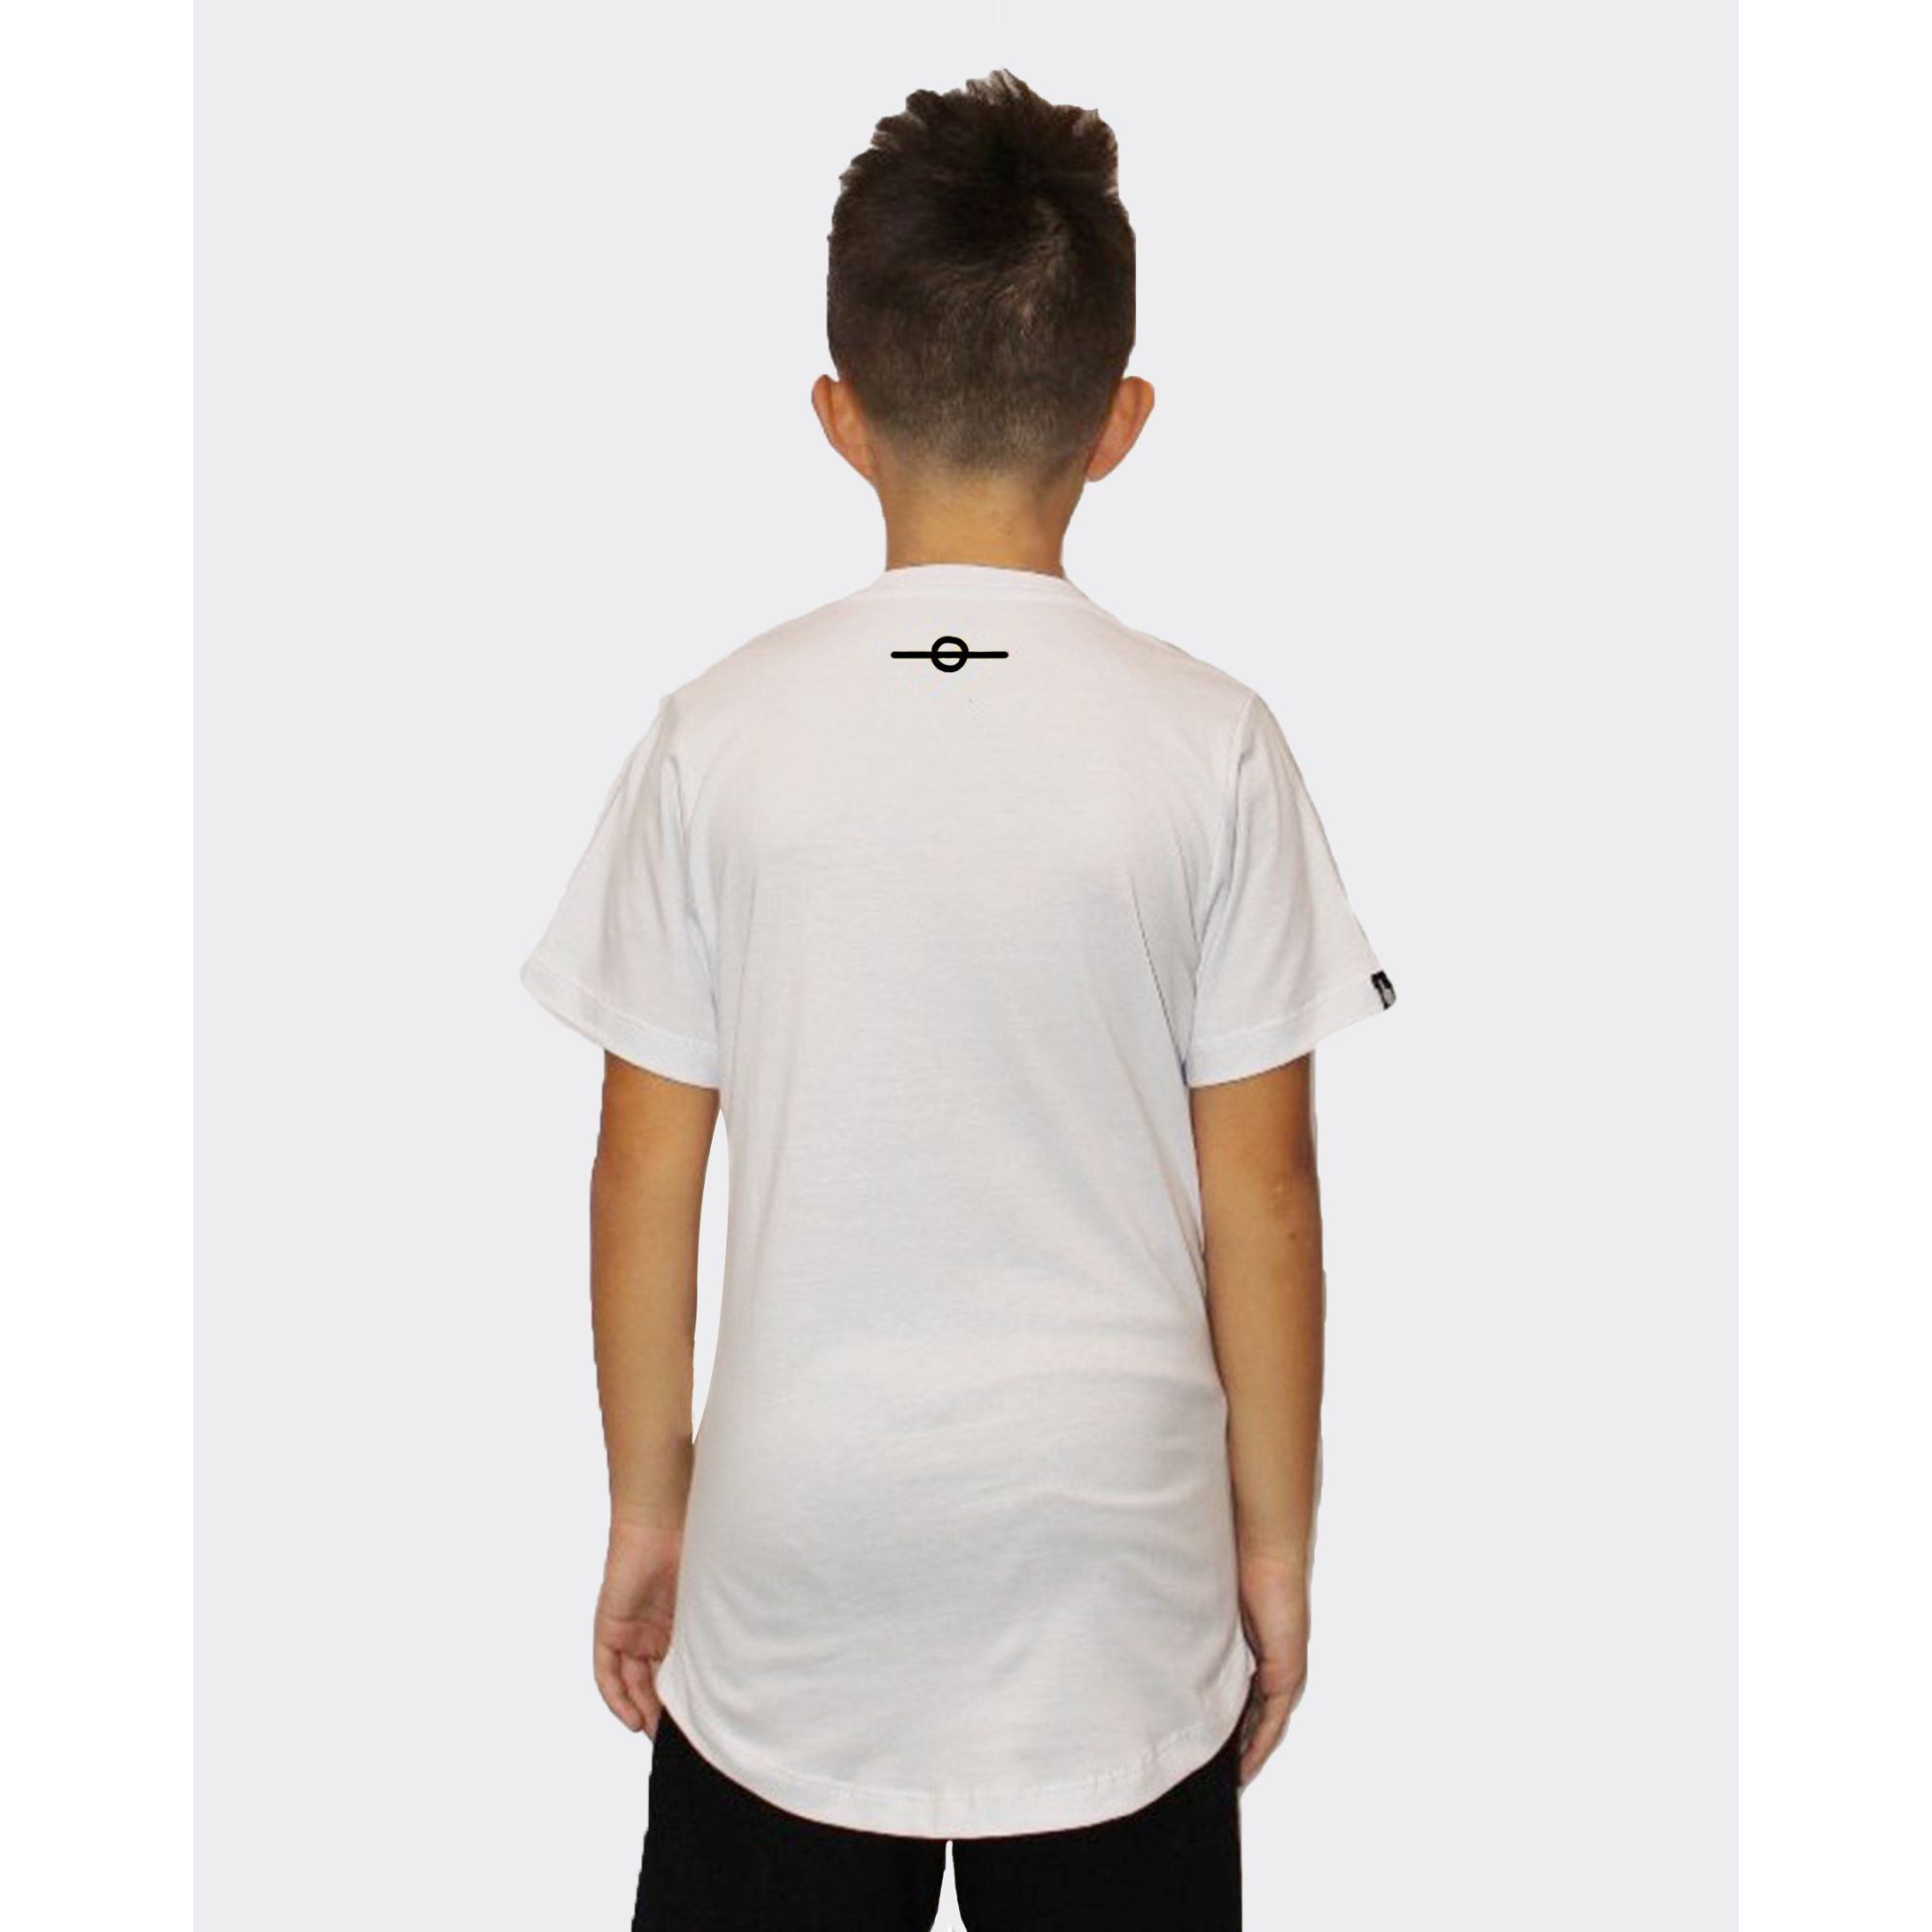 Camiseta Buh Kids Little Square White